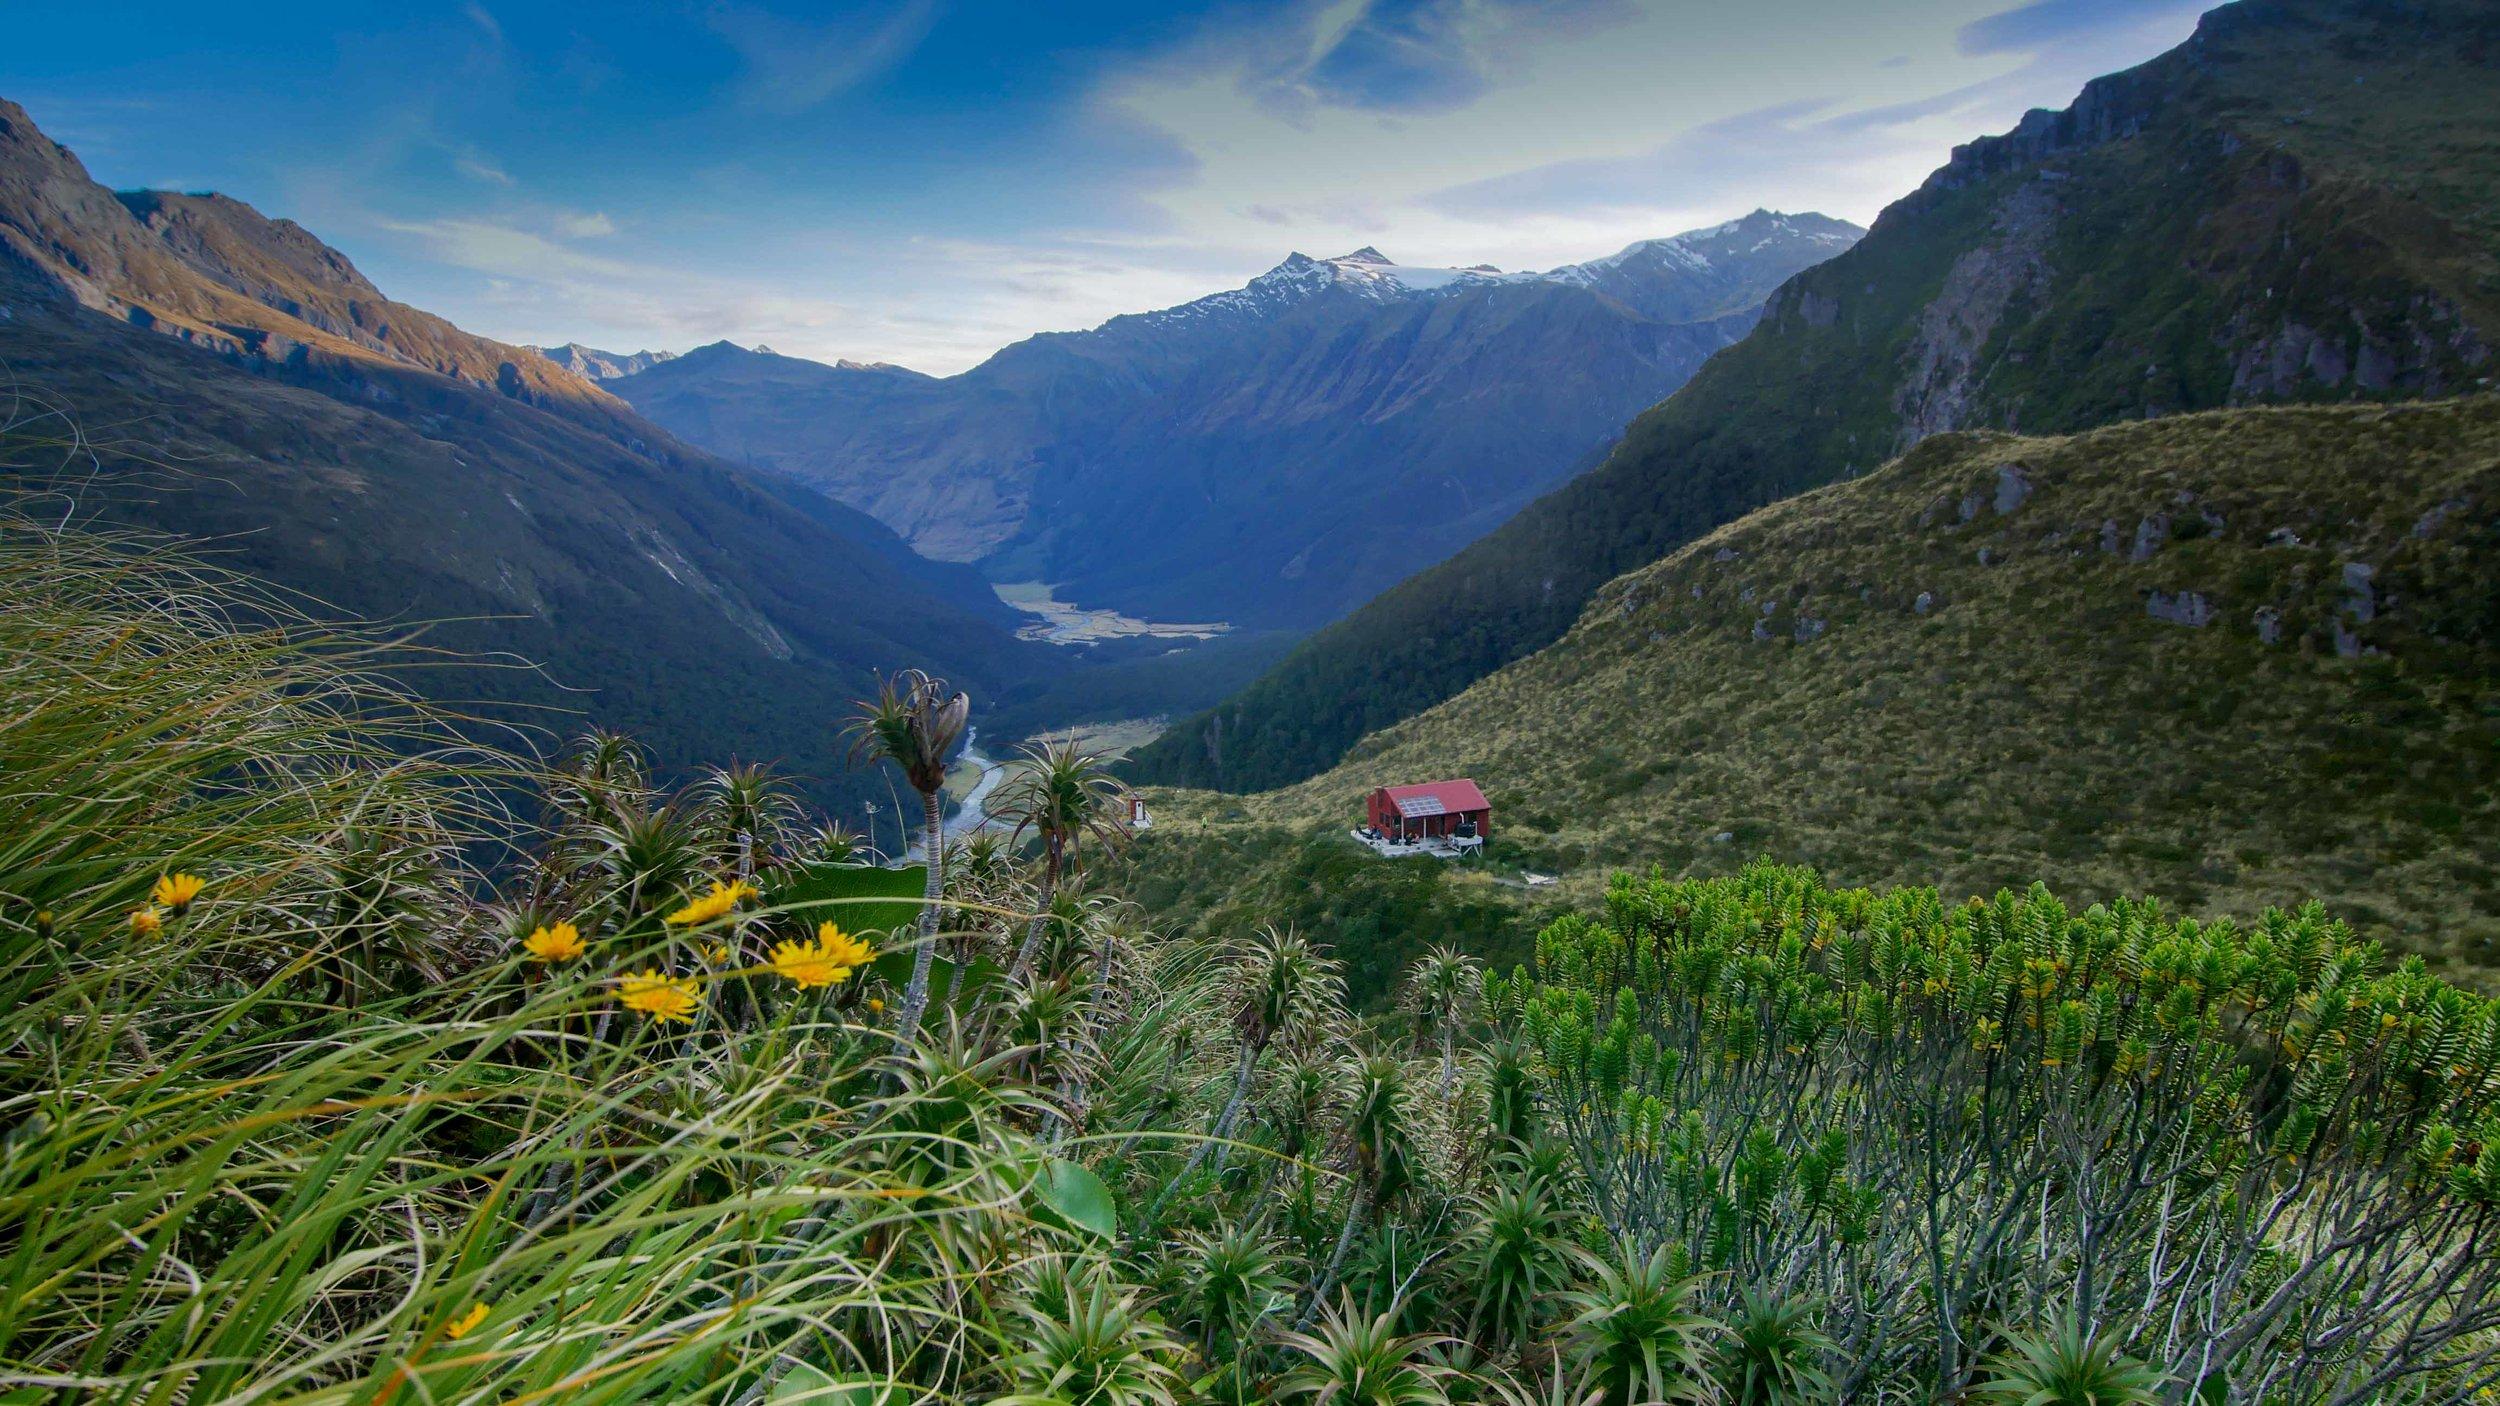 Liverpool Hut New Zealand Lake Wanaka Mount Aspiring (1 of 4).jpg